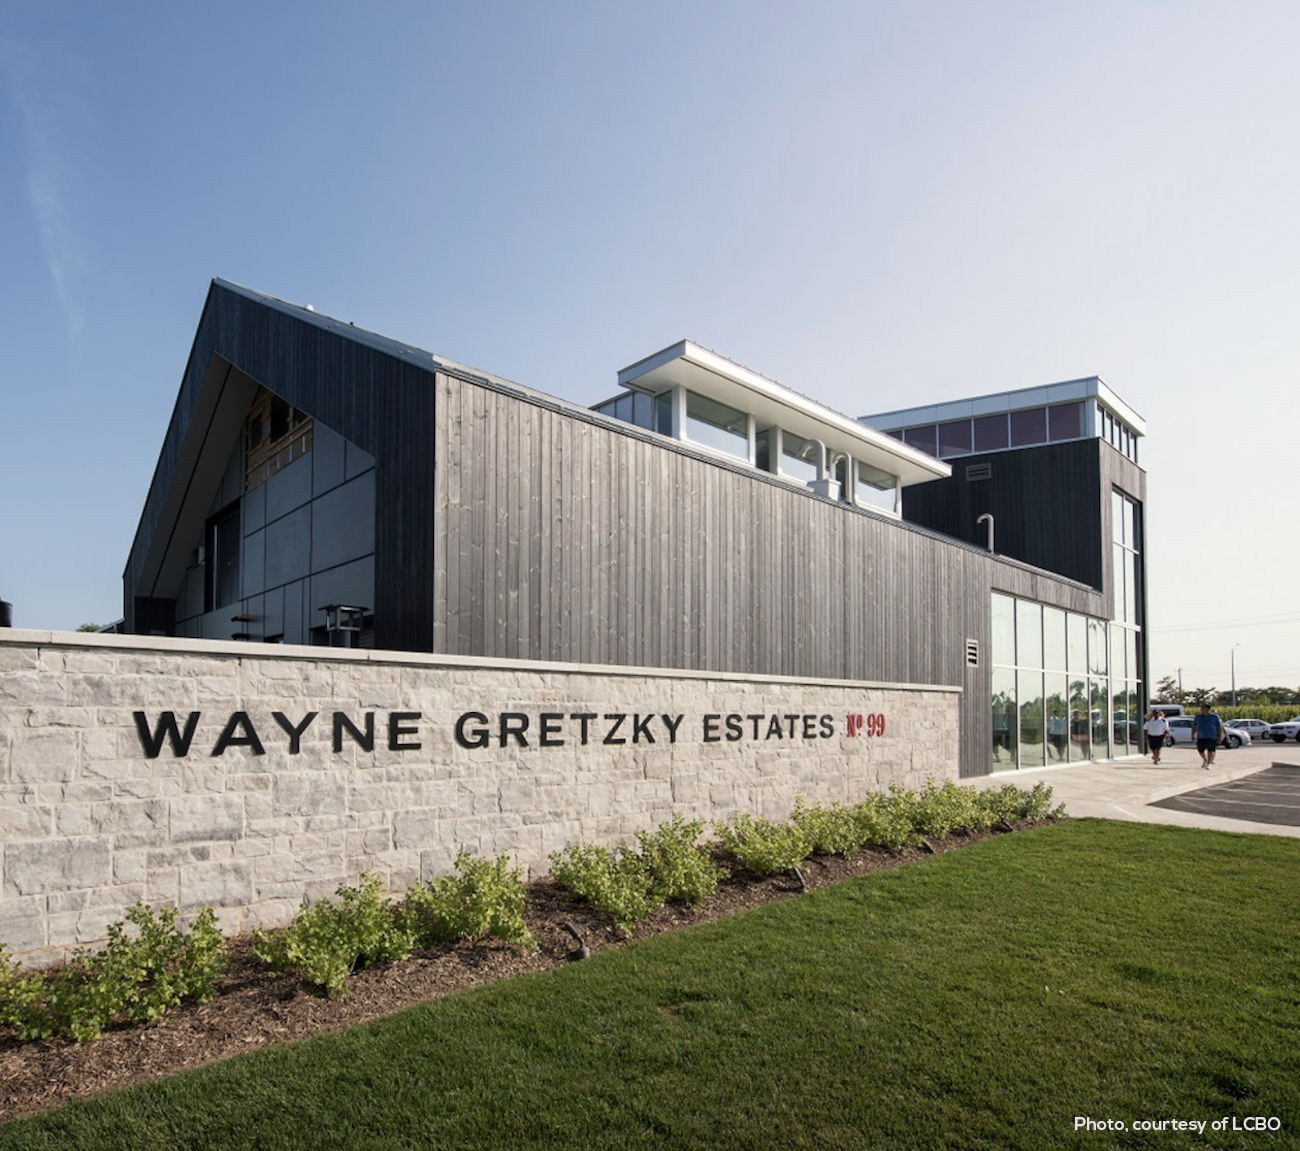 Wayne Gretzky Estate Winery & Craft Distillery, Niagara-on-the-Lake, Ontario